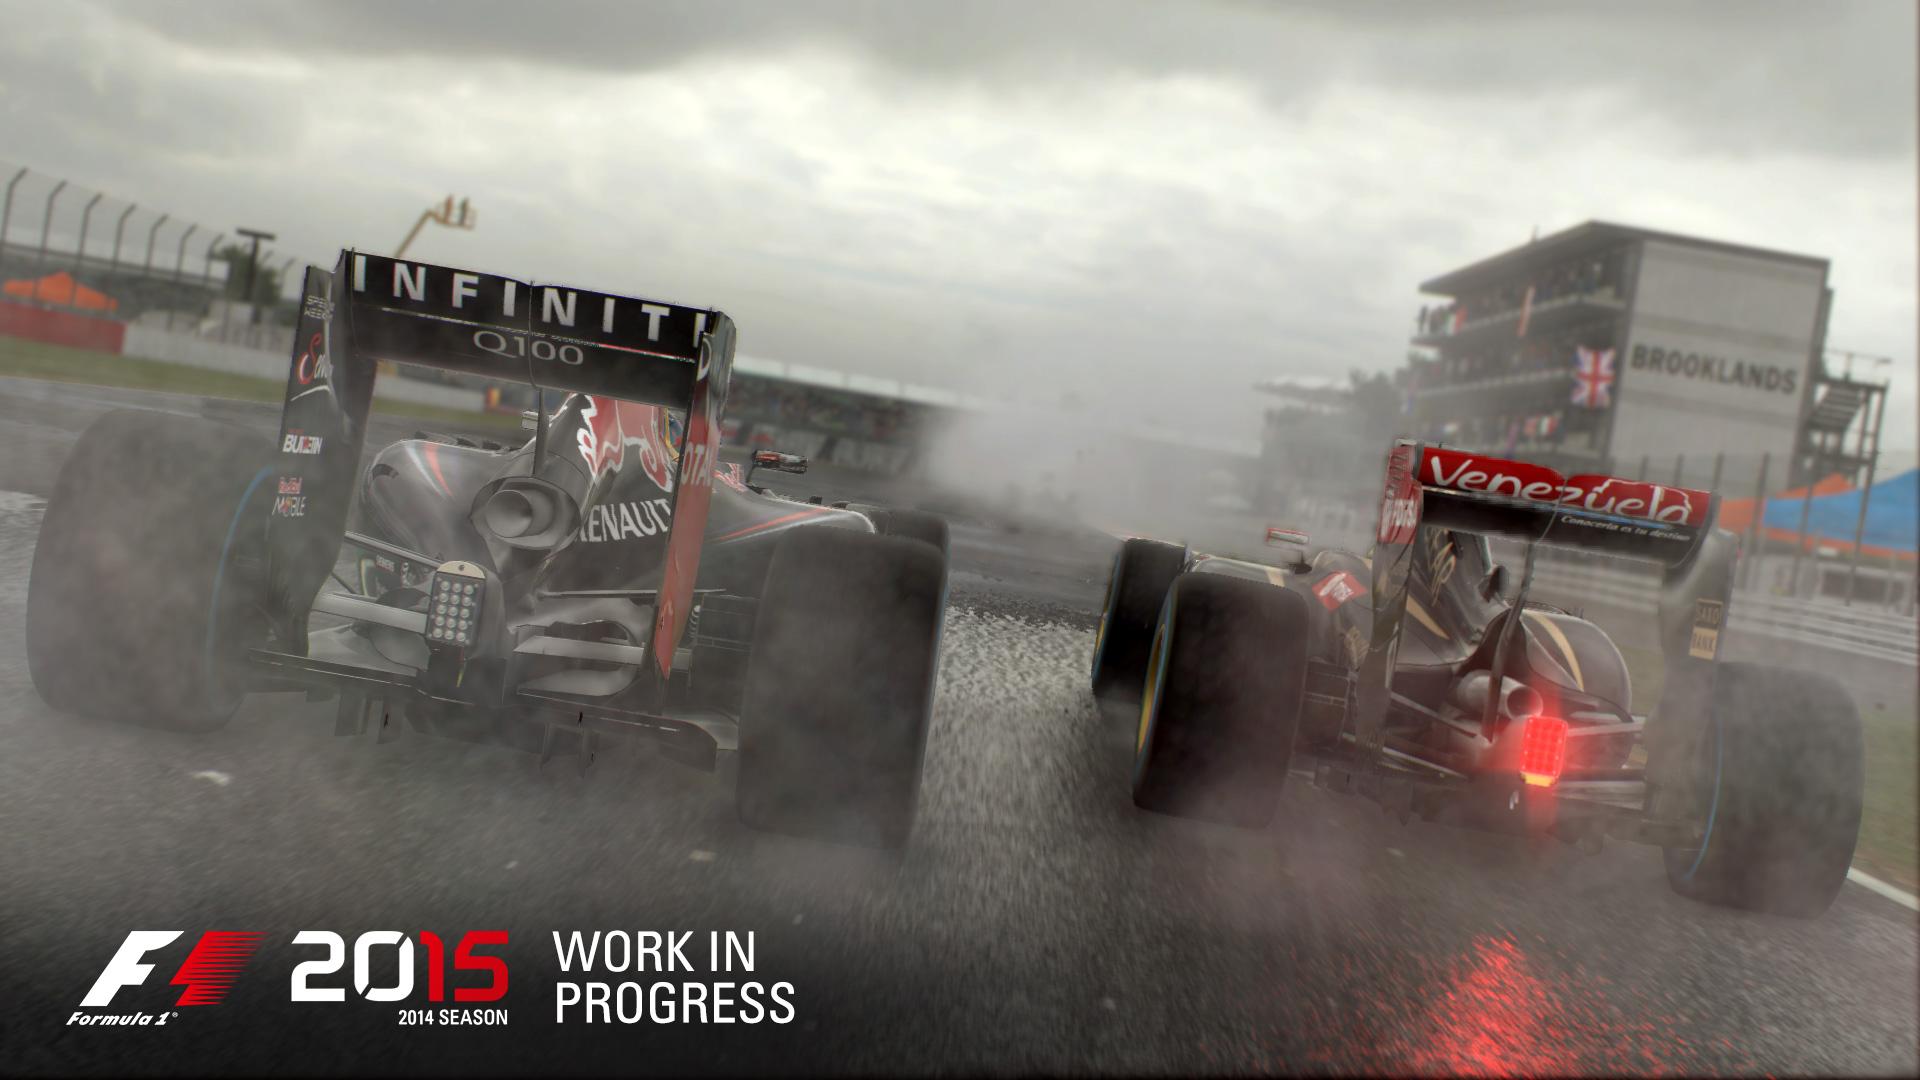 F1 2015 ESPAÑOL PC Full (CPY) + UPDATE v1.0.19.5154 + REPACK 2 DVD5 (JPW) 7